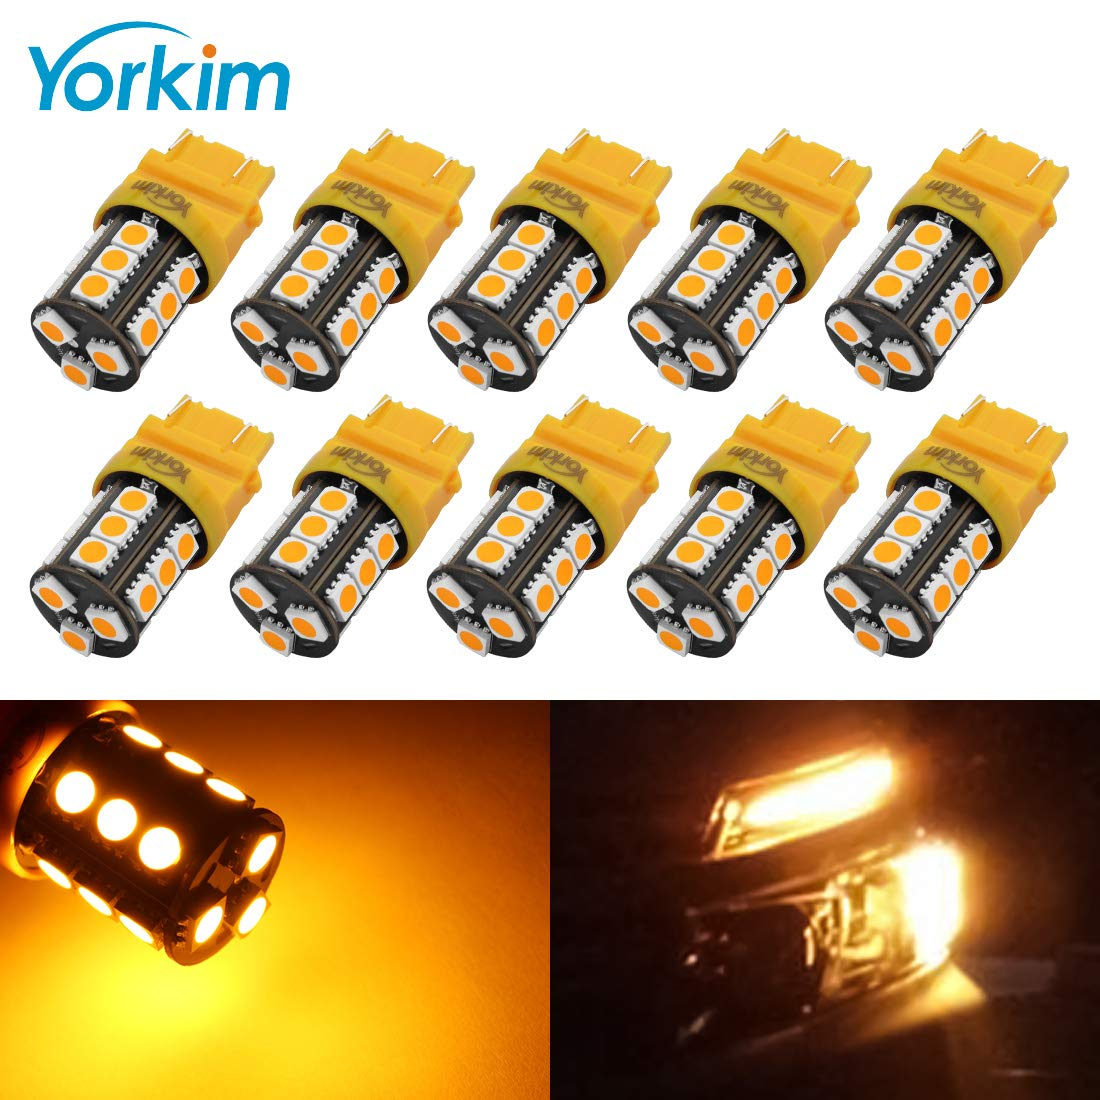 Yorkim Super Bright 3157 LED Light Bulbs Amber Pack of 10, 3157 LED Brake Lights, 3157 LED Backup Reverse Lights, 3156 LED Reverse Tail Lights, Turn Signal Led - 3056 3156 3057 3157 4157 LED Bulbs by Yorkim